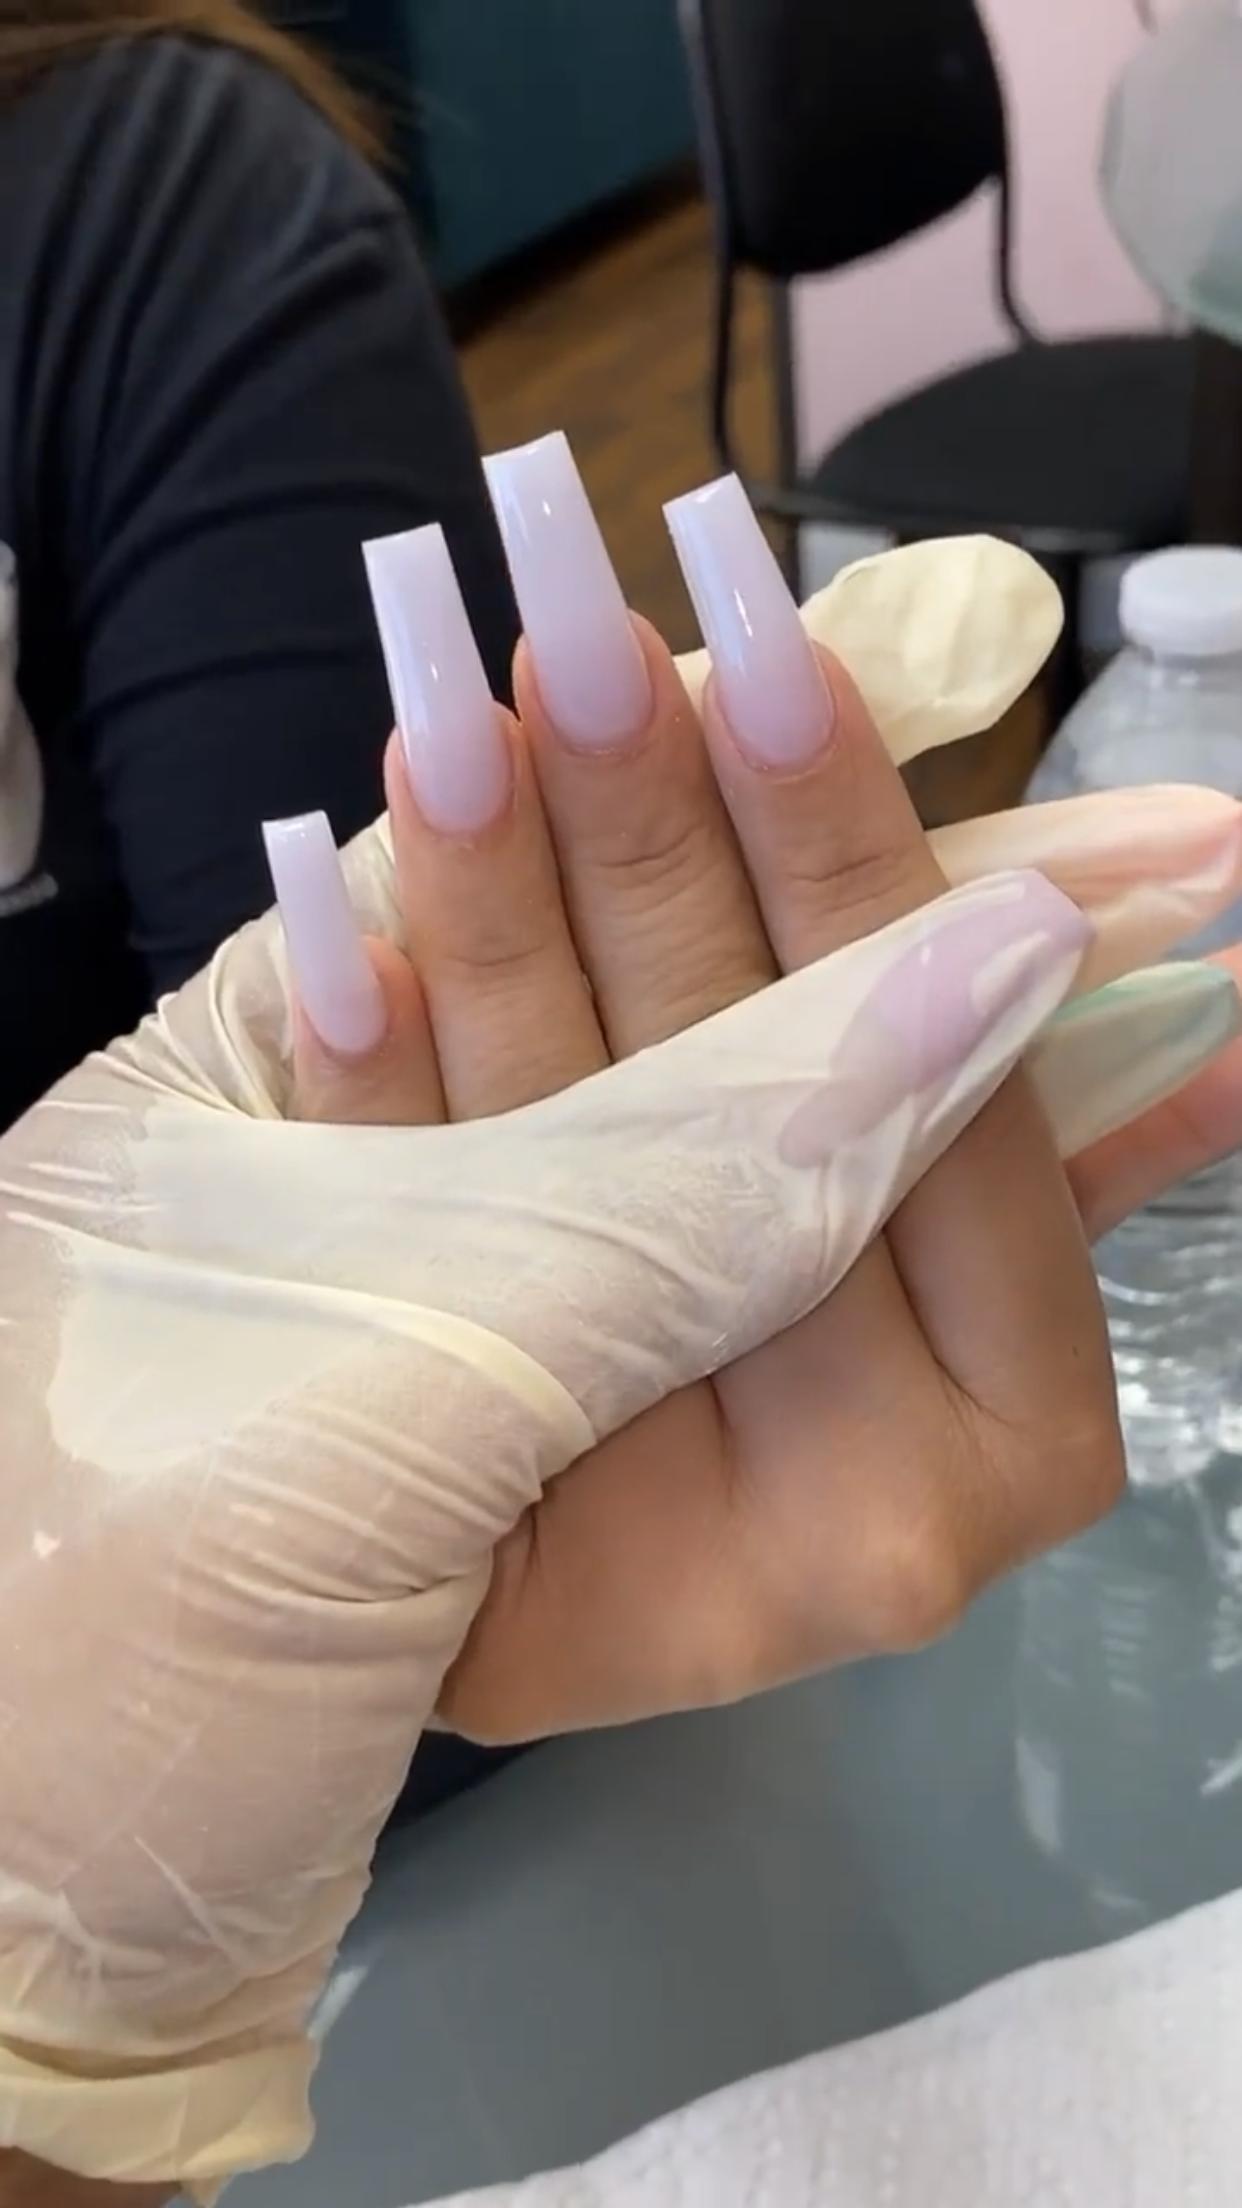 Milky White Medium Tapered Square Acrylic Nails In 2020 Square Acrylic Nails Acrylic Nails Long Nails